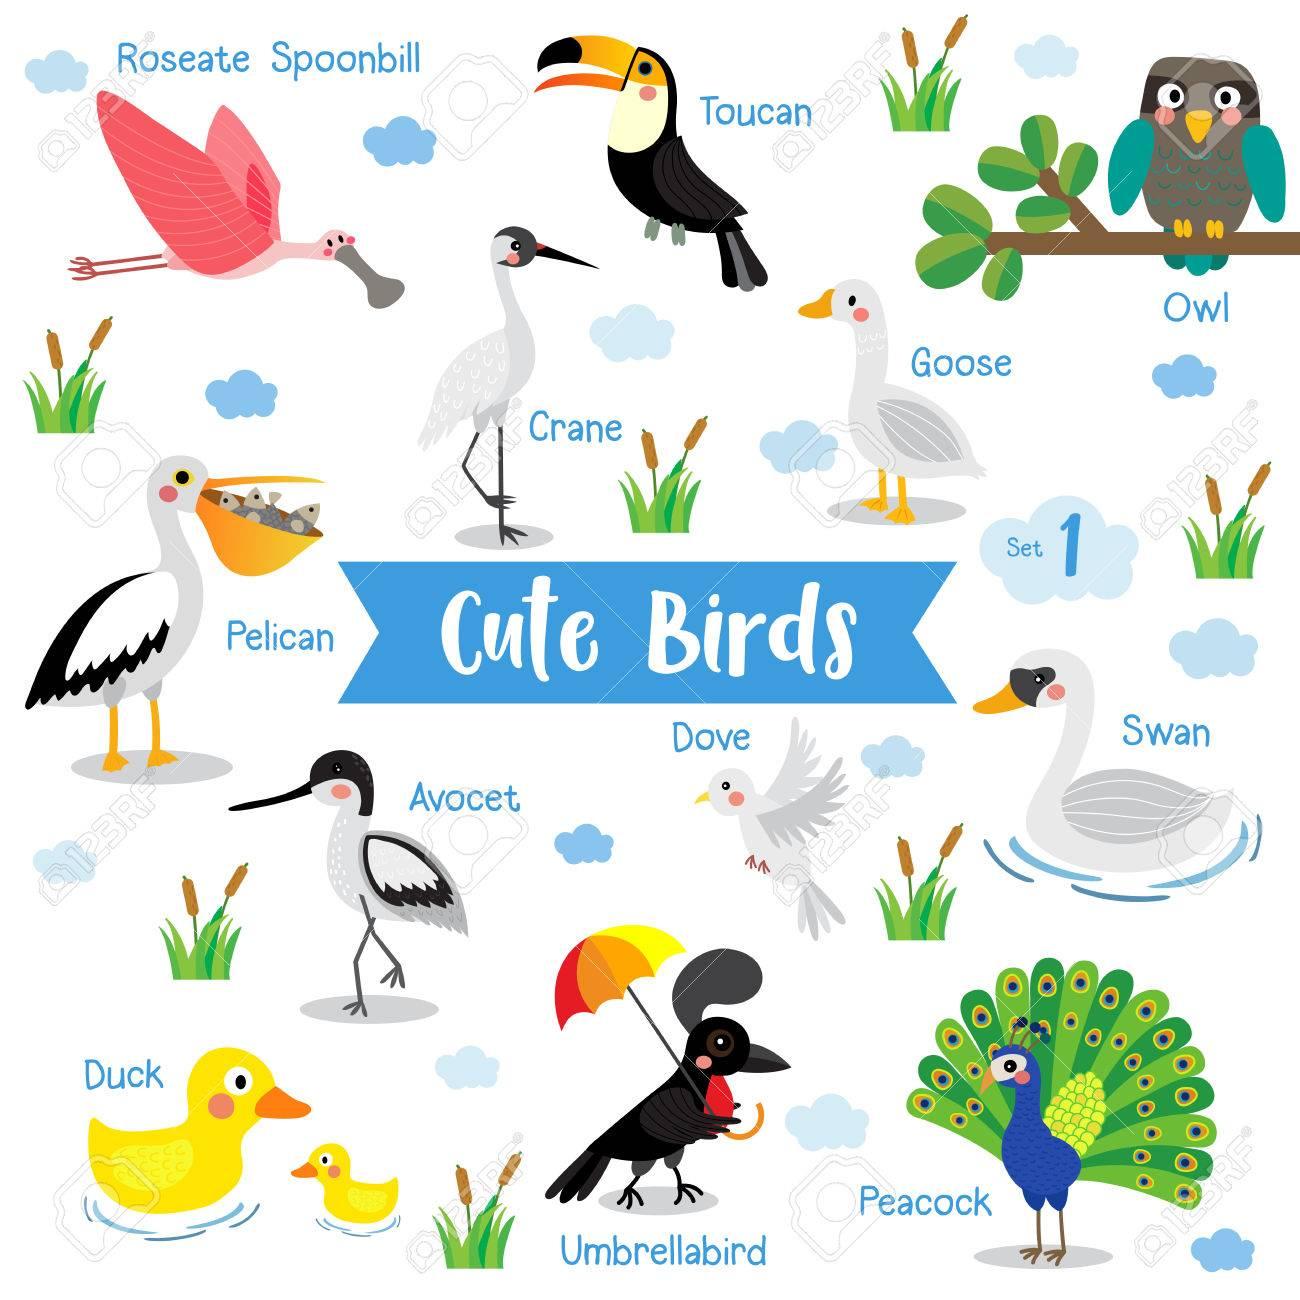 Cute Birds Animal Cartoon On White Background With Animal Name